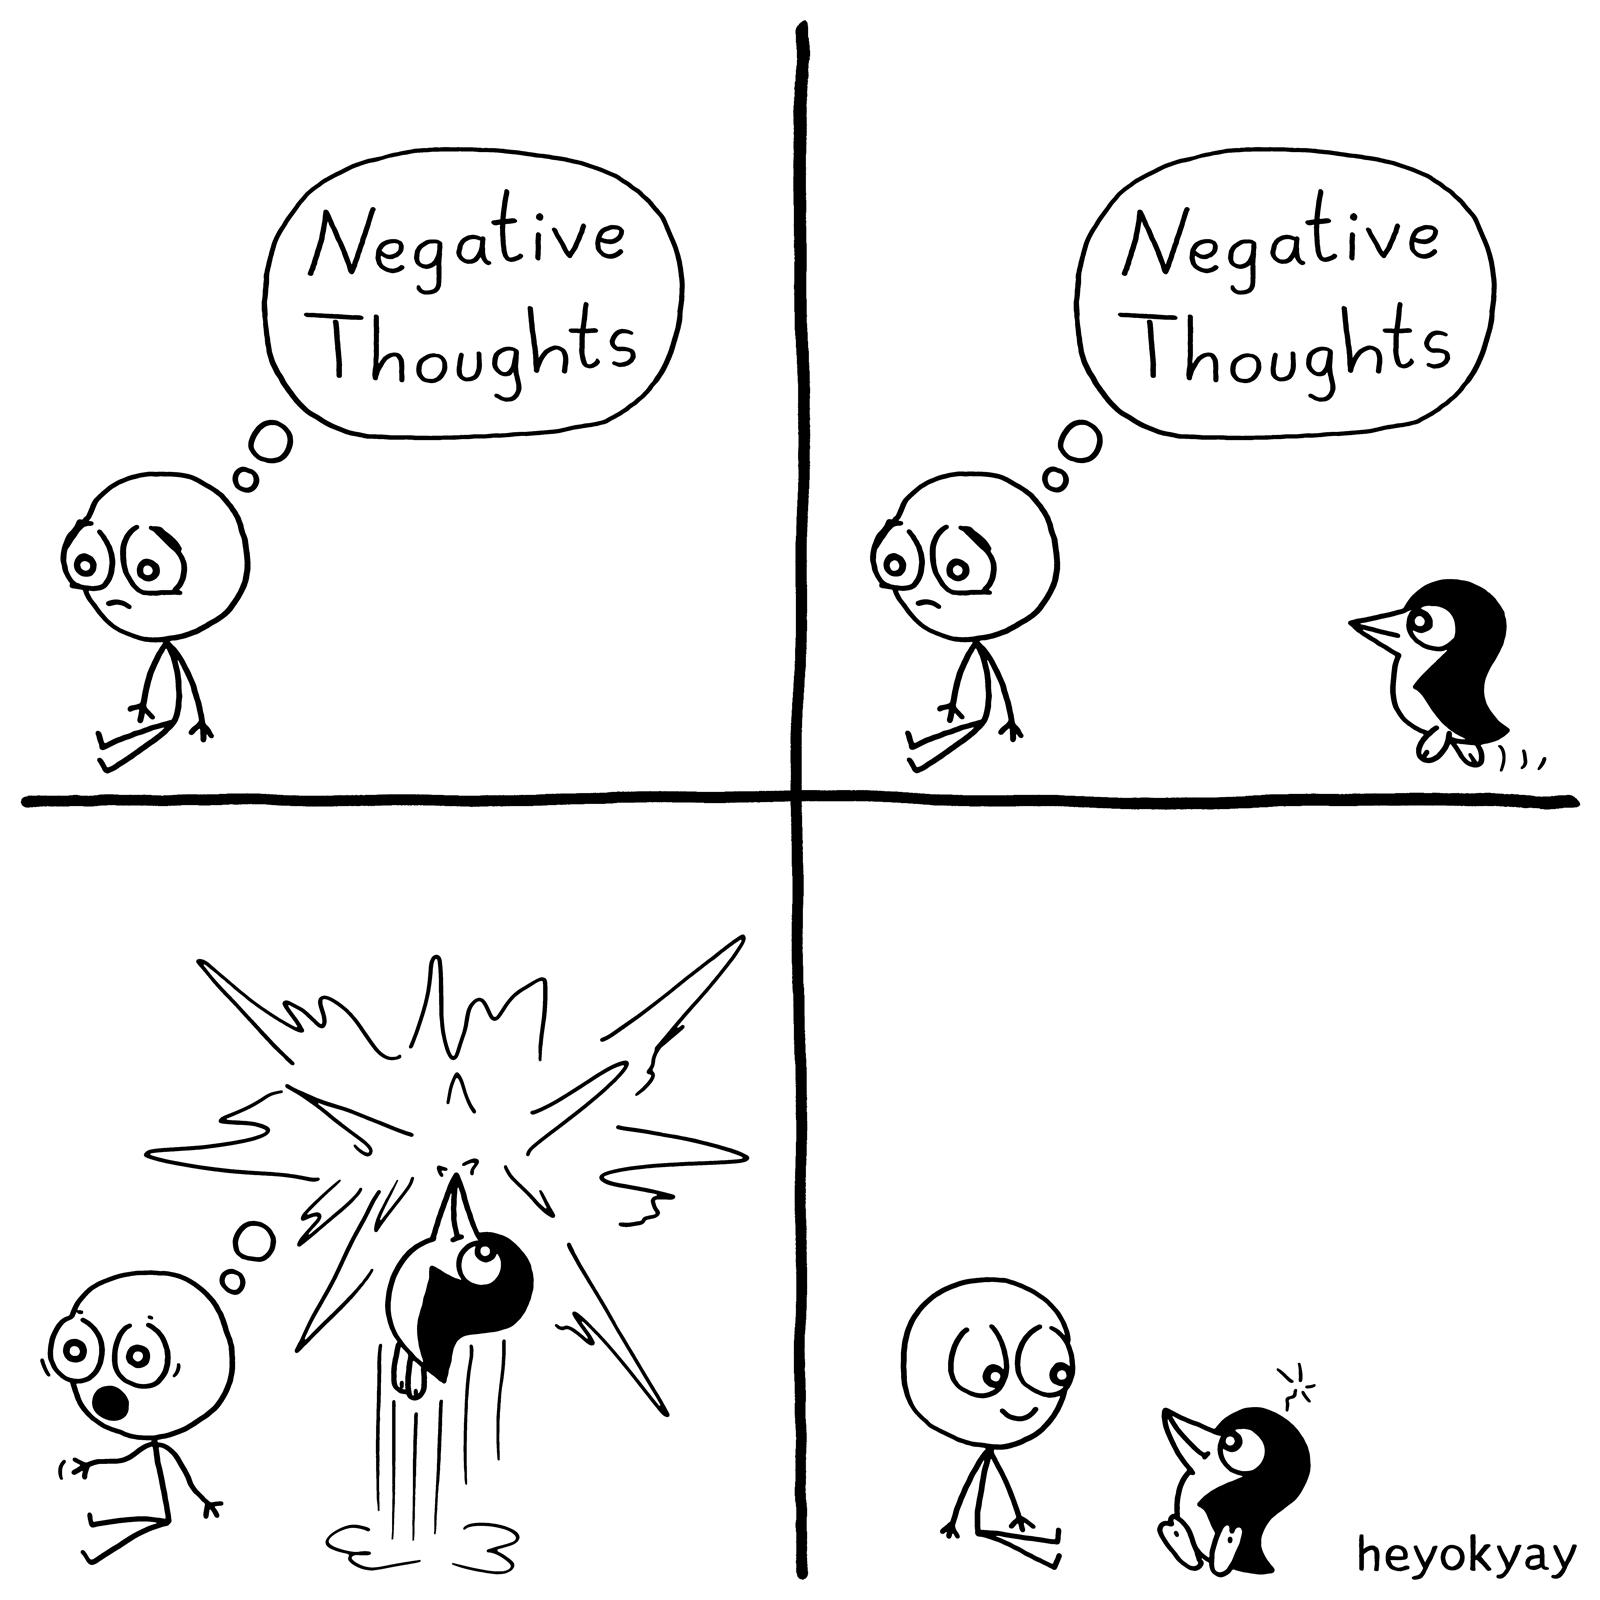 Negative Thoughts heyokyay comic